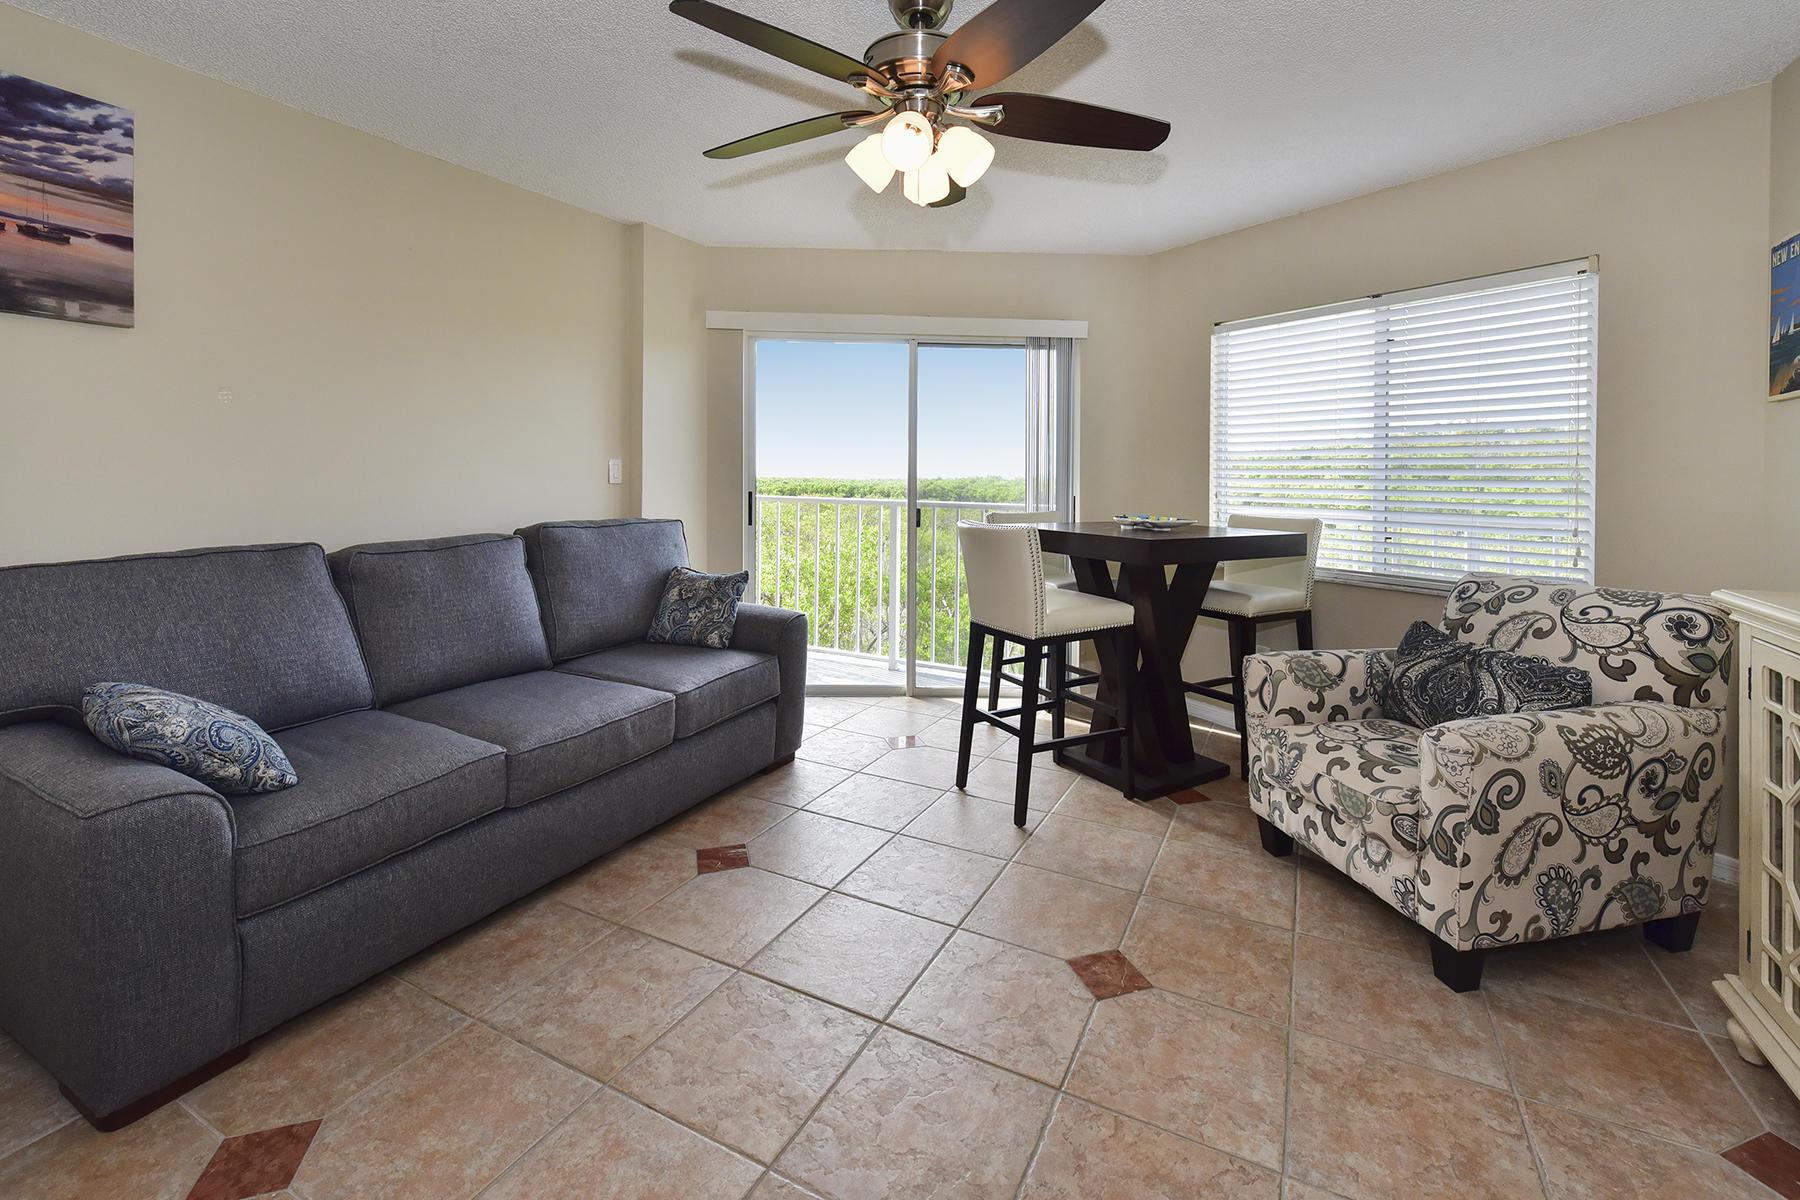 condominiums for Active at 500 Burton Drive, #2214, Tavernier, FL 500 Burton Drive 2214 Tavernier, Florida 33037 United States